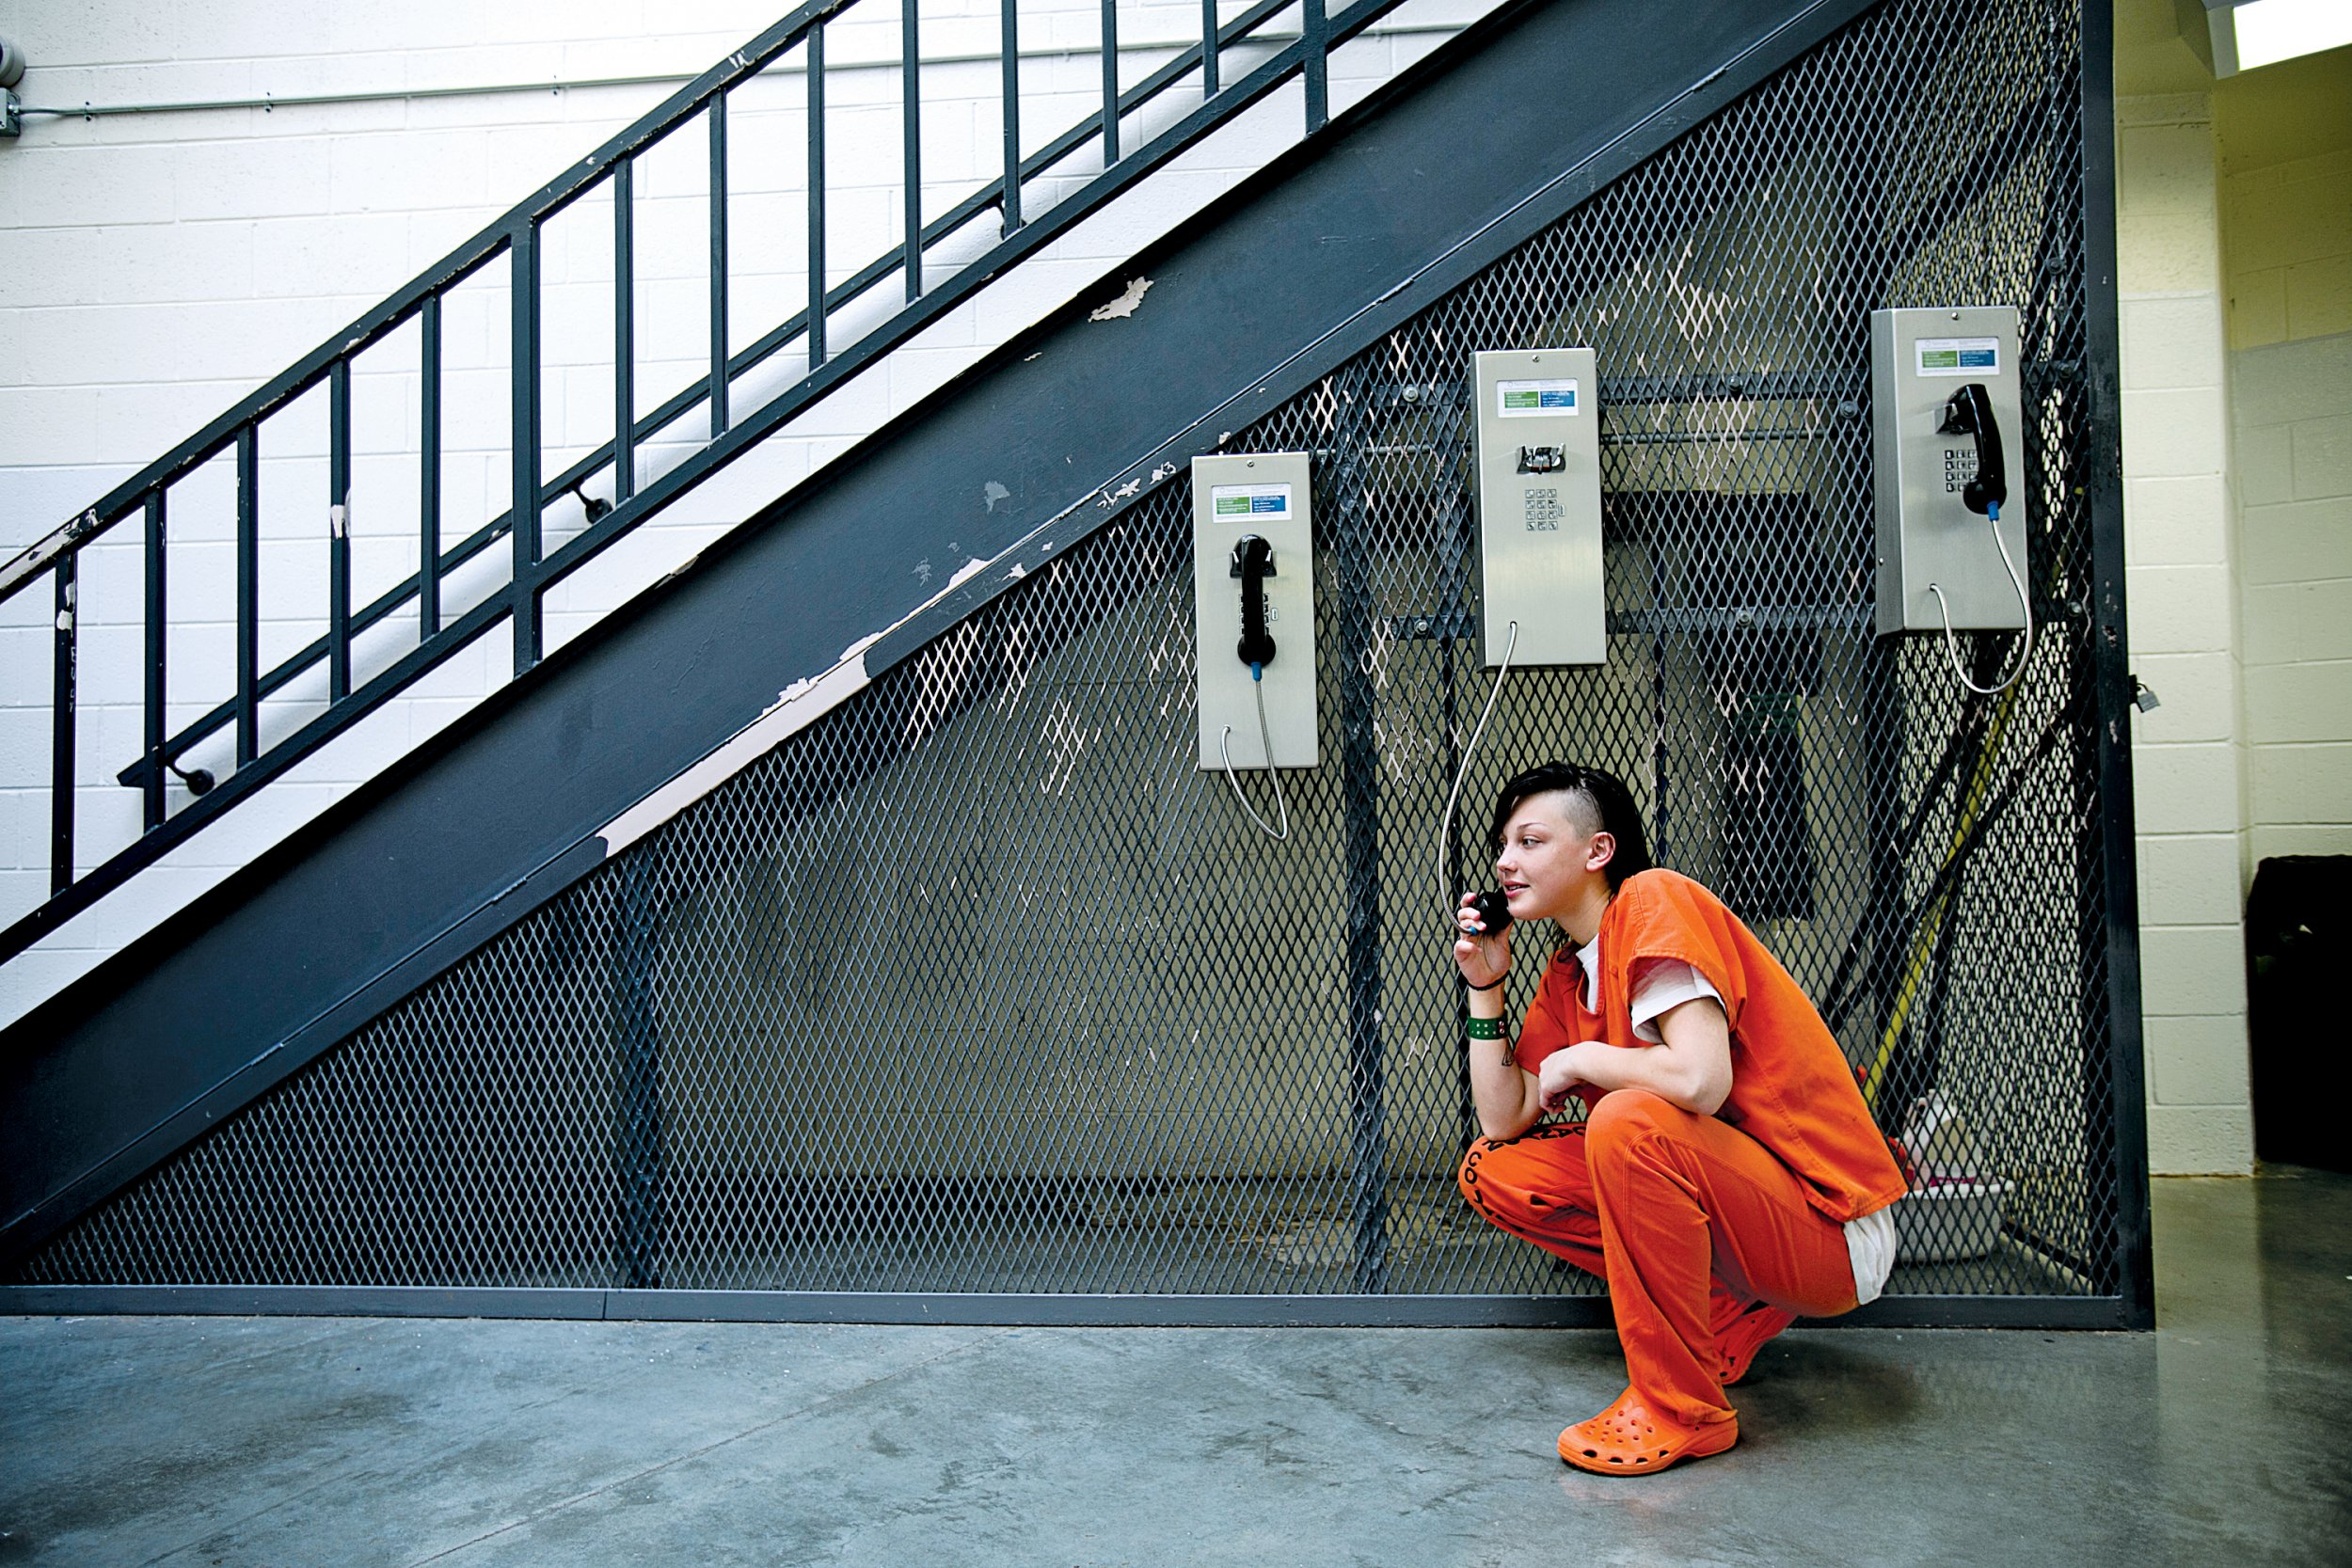 06_24_PrisonCalls_01